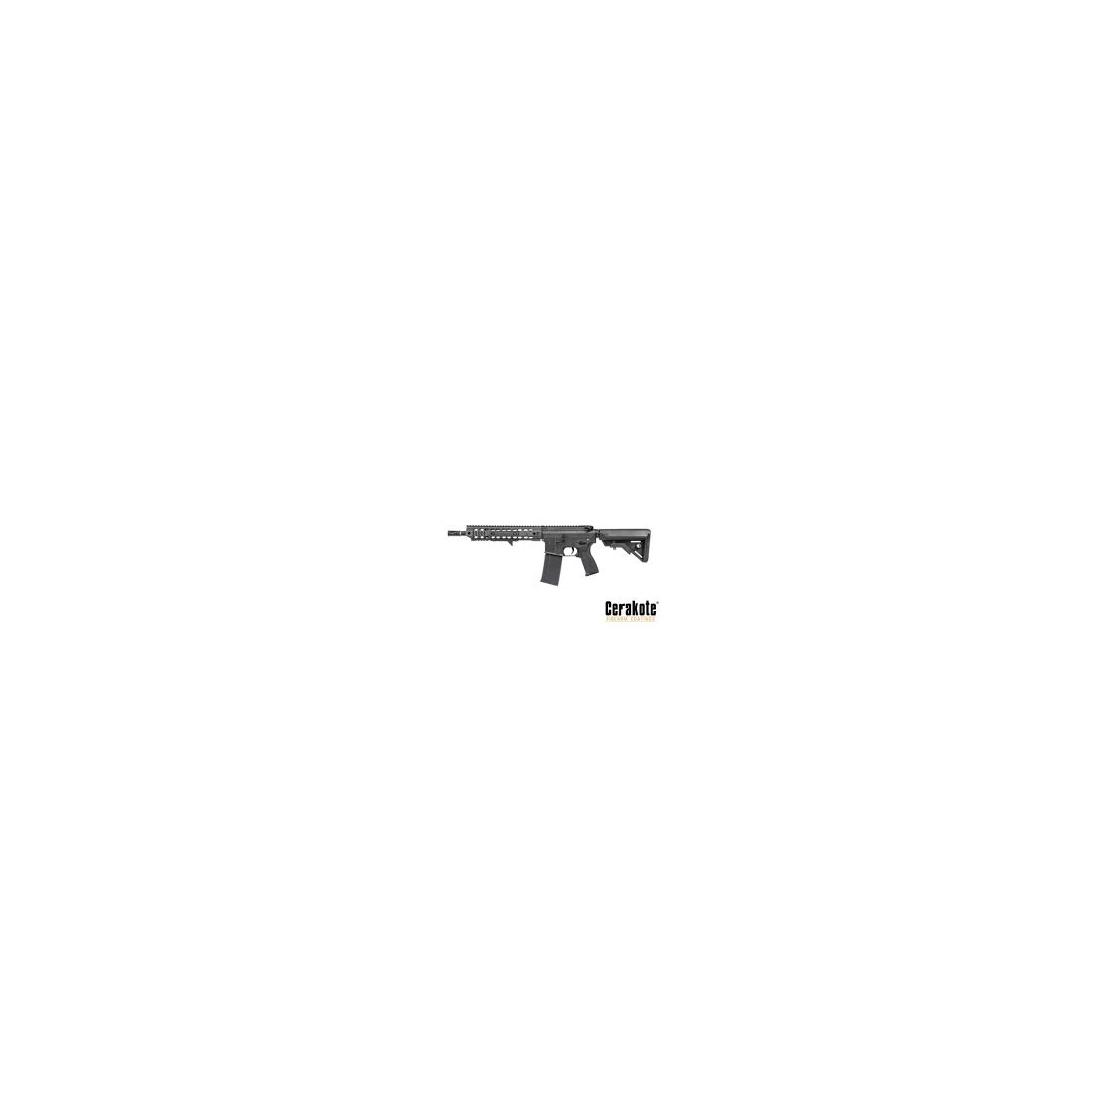 "AEG M4 URX3 10.25"" CQB bk [Lone Star]"